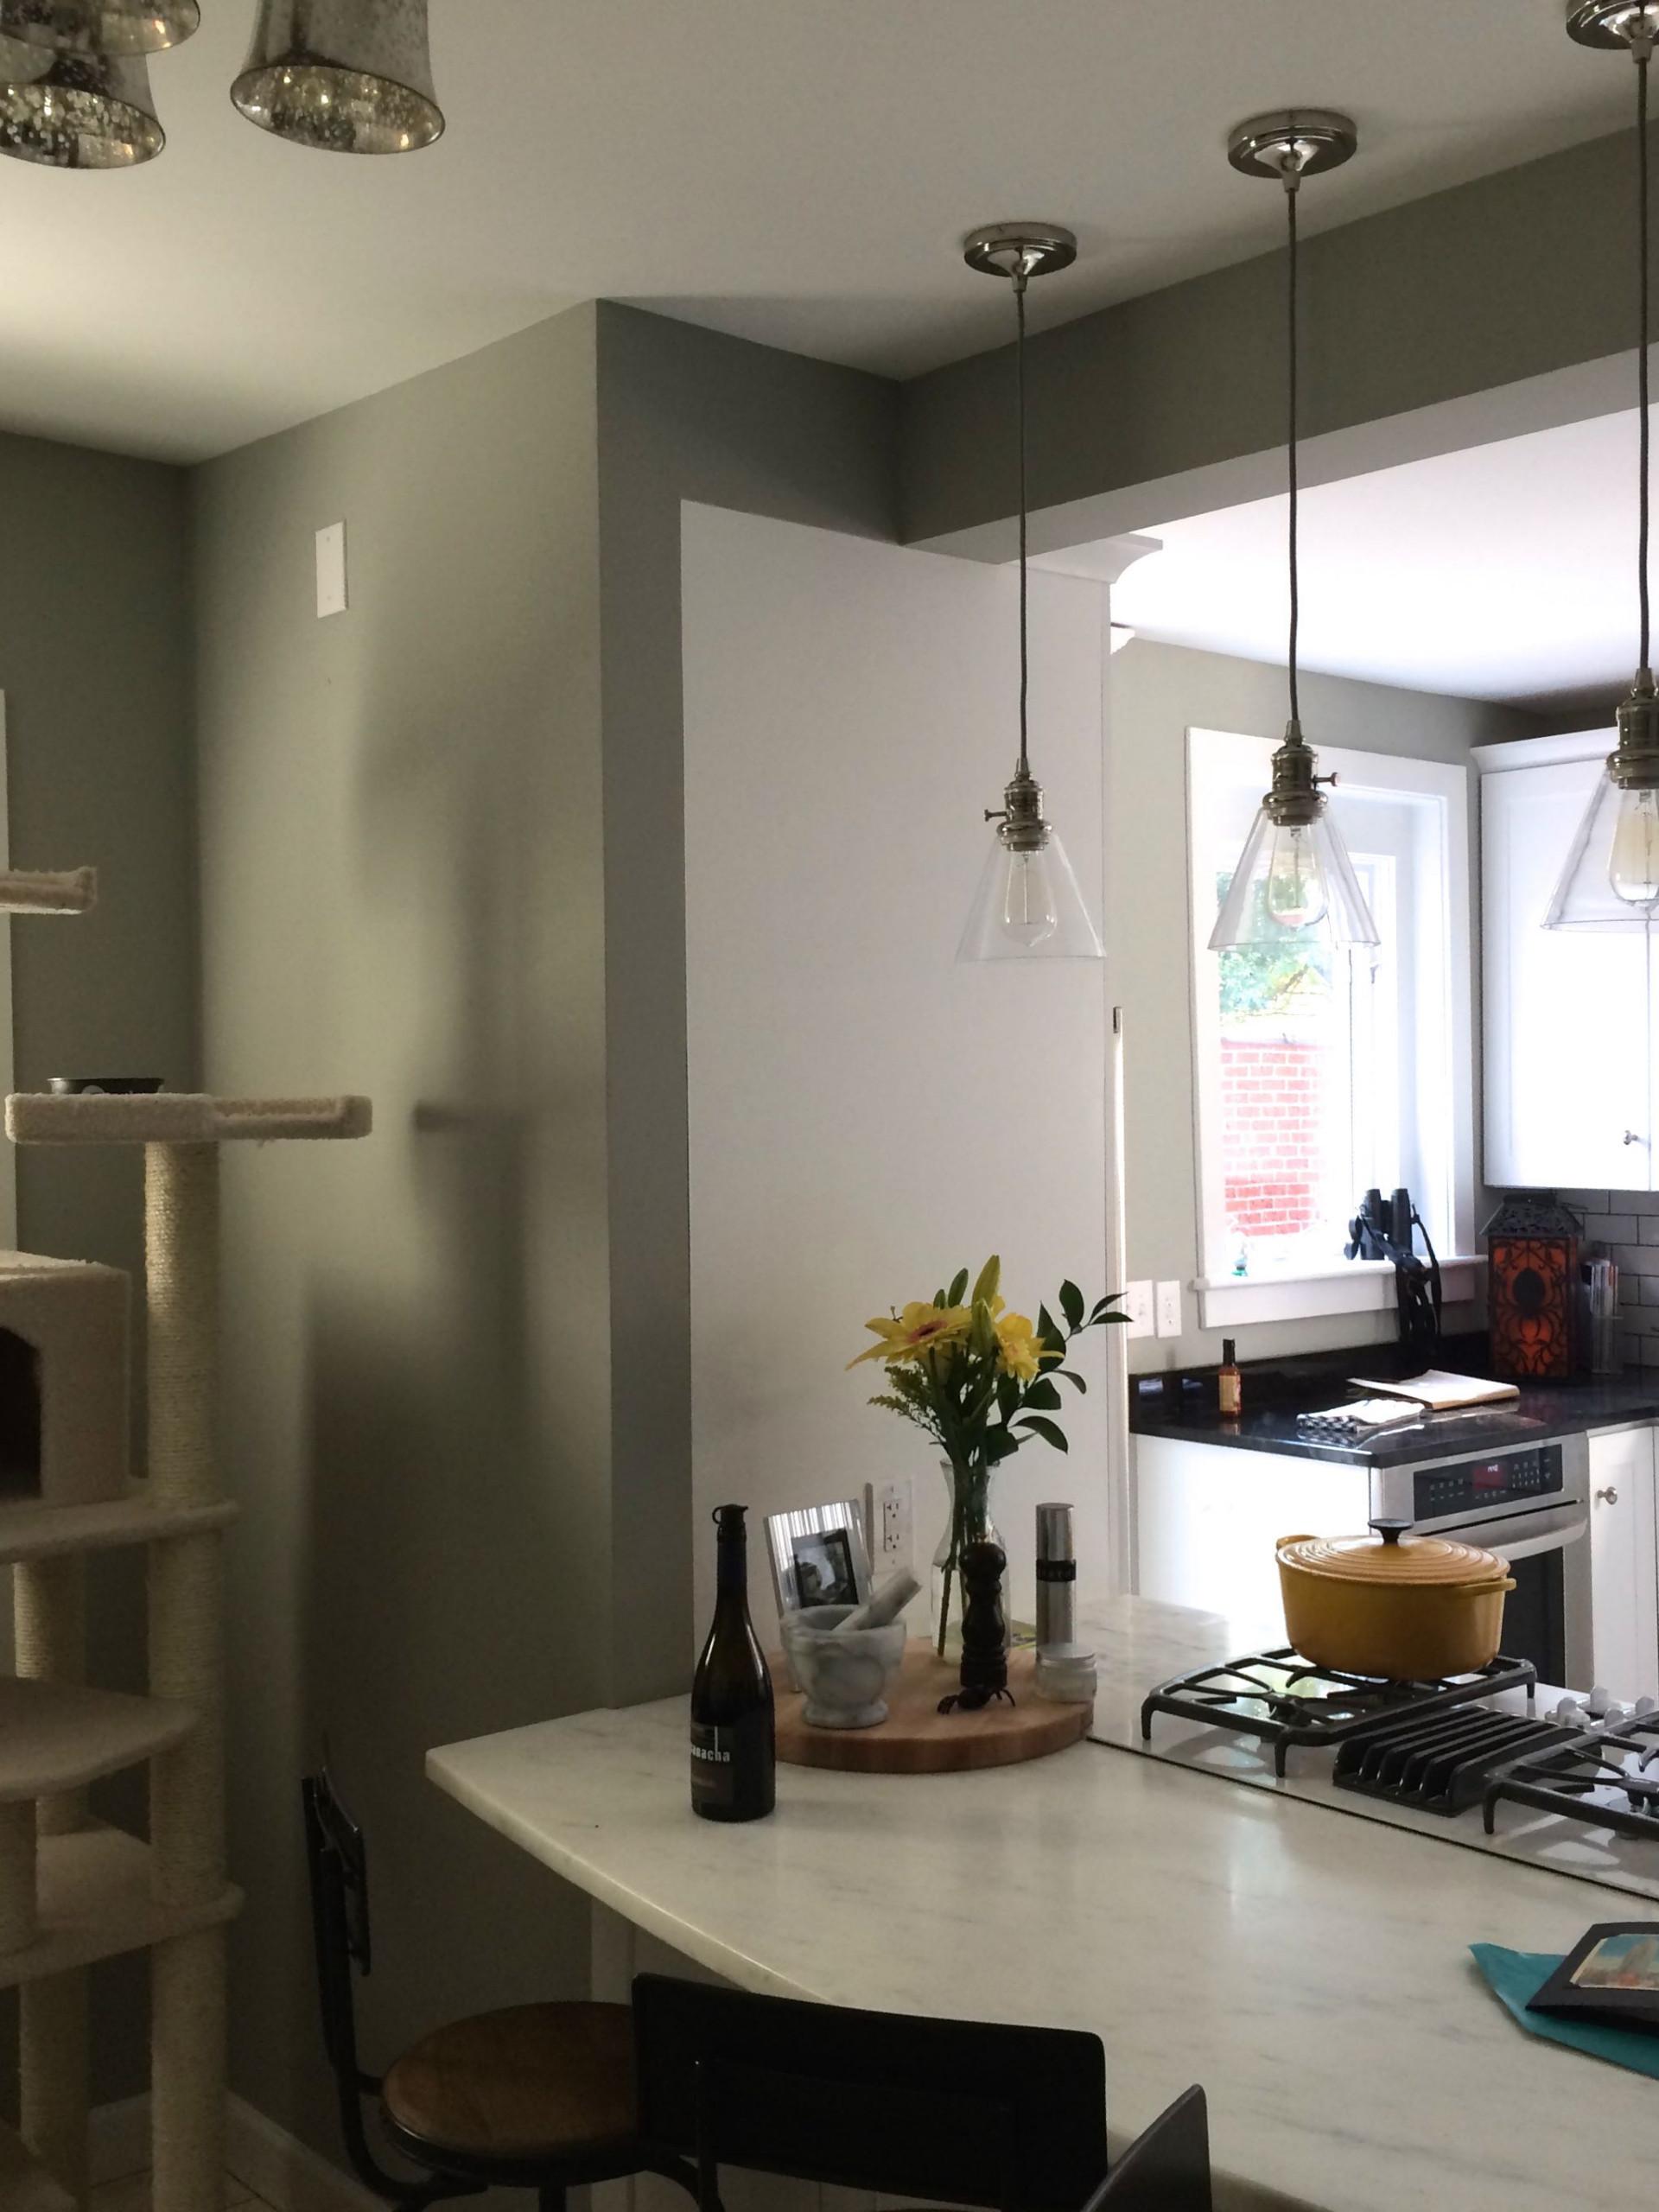 Daly kitchen